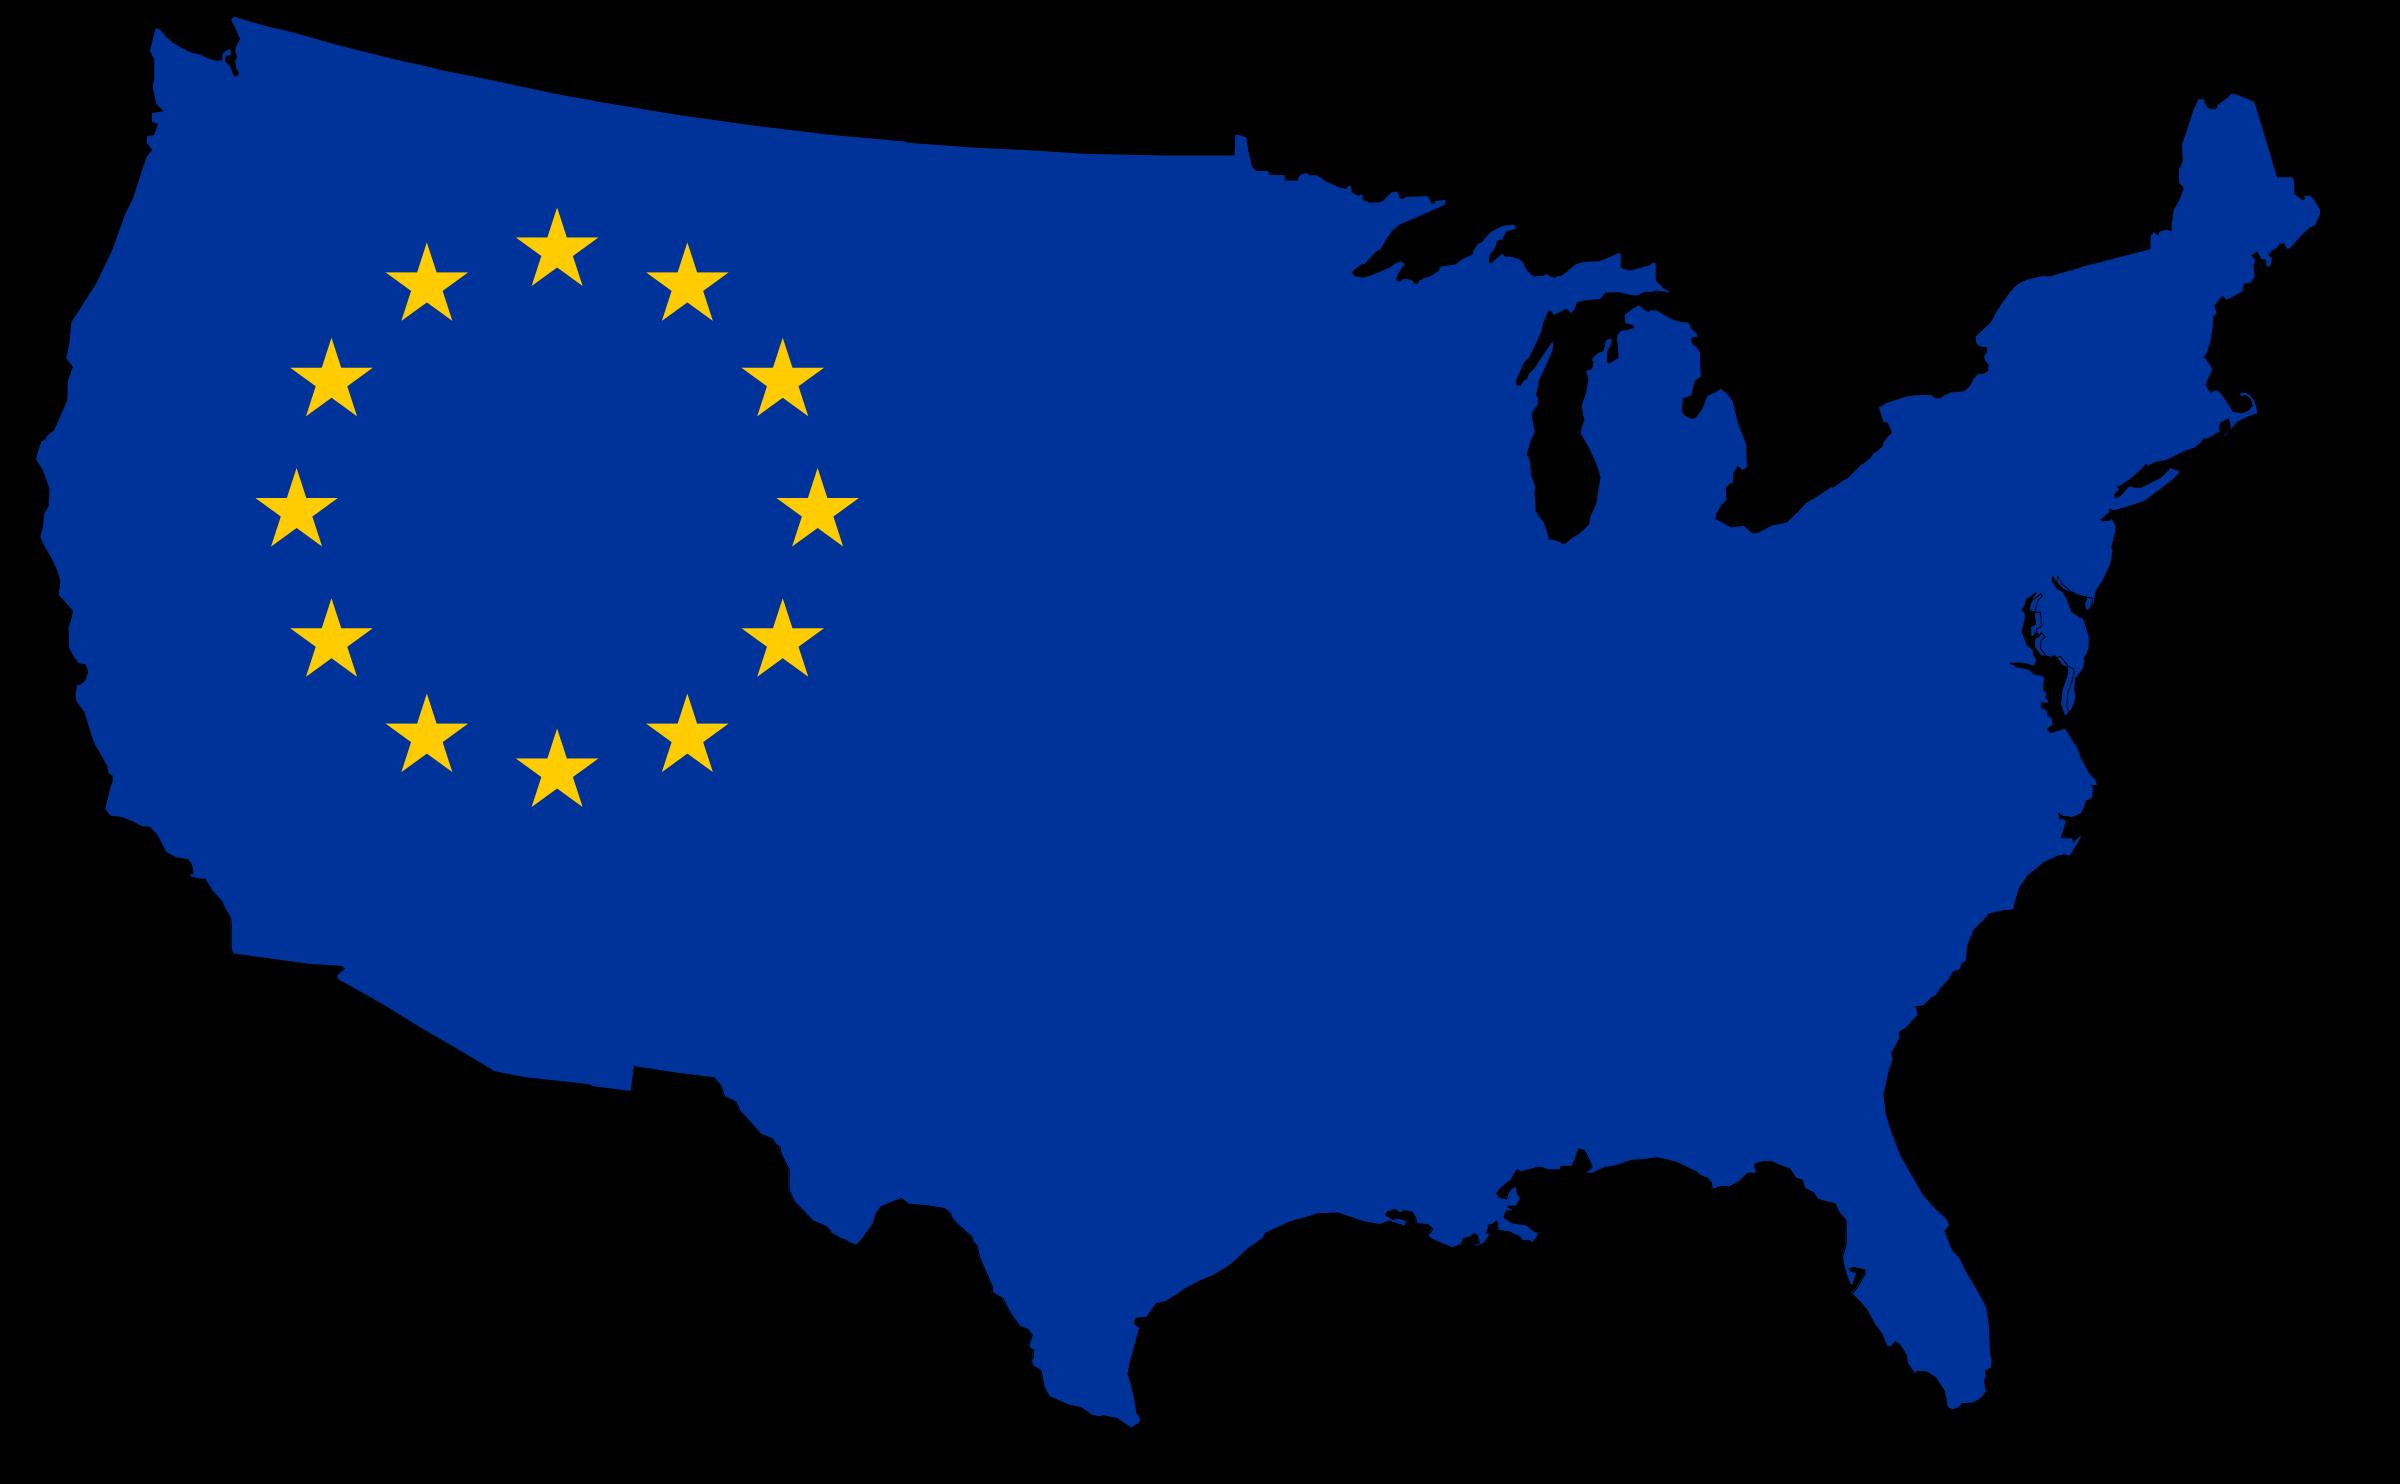 Us flag map big. Europe clipart transparent